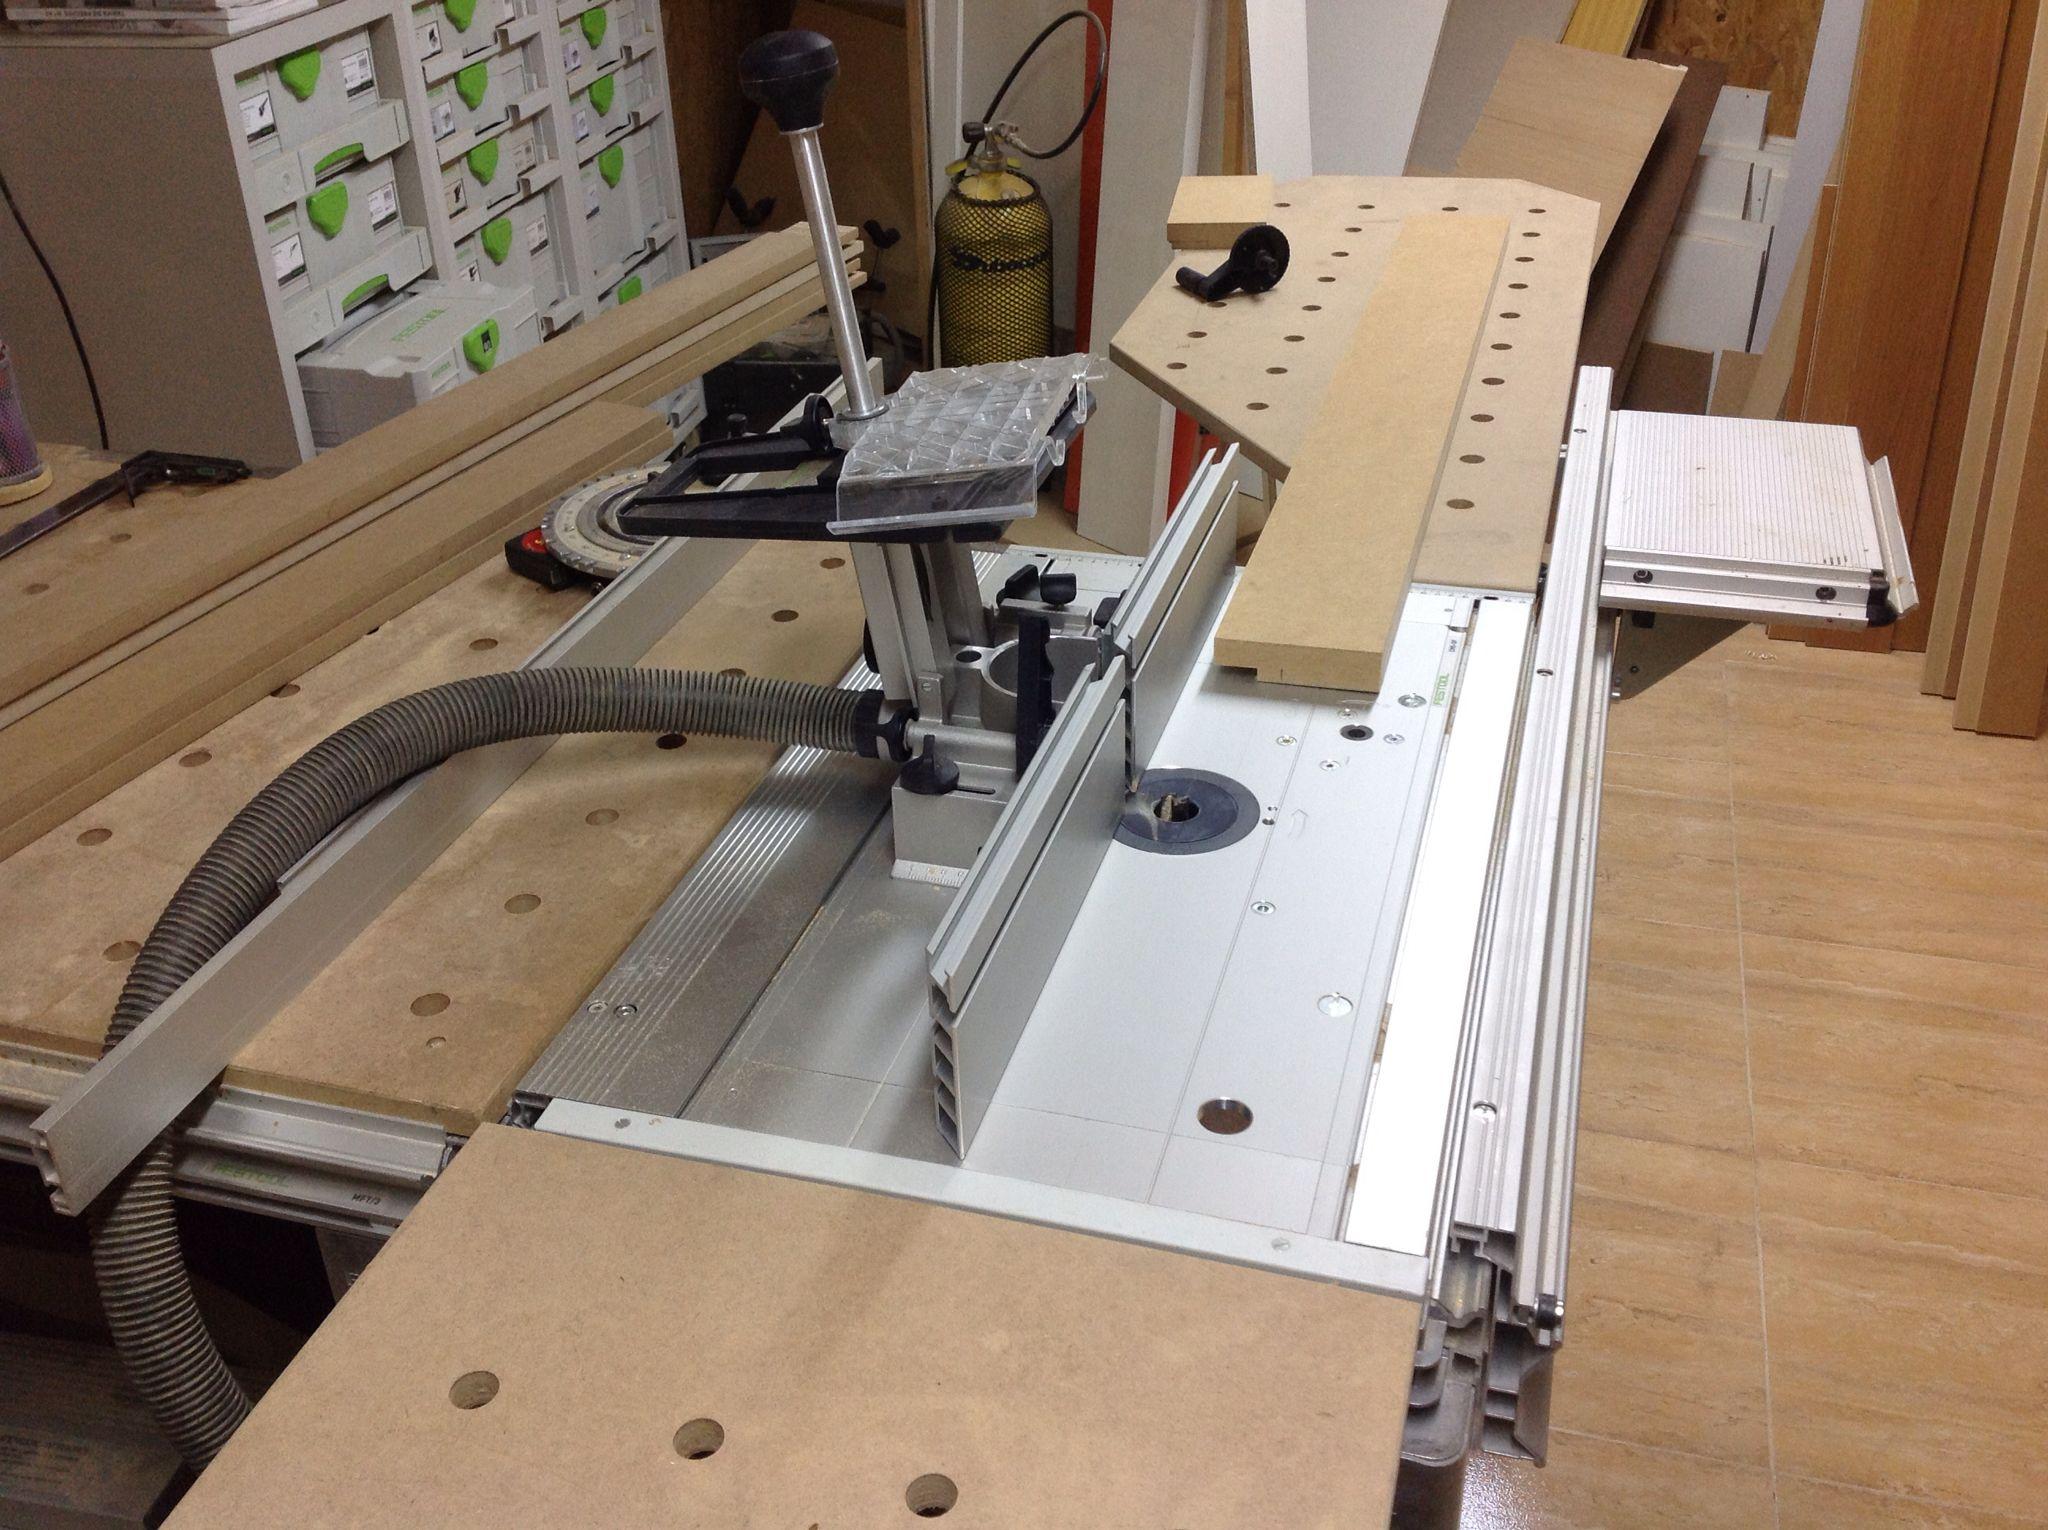 Mtf sistema fresadora festool festool mft workbench for Table festool